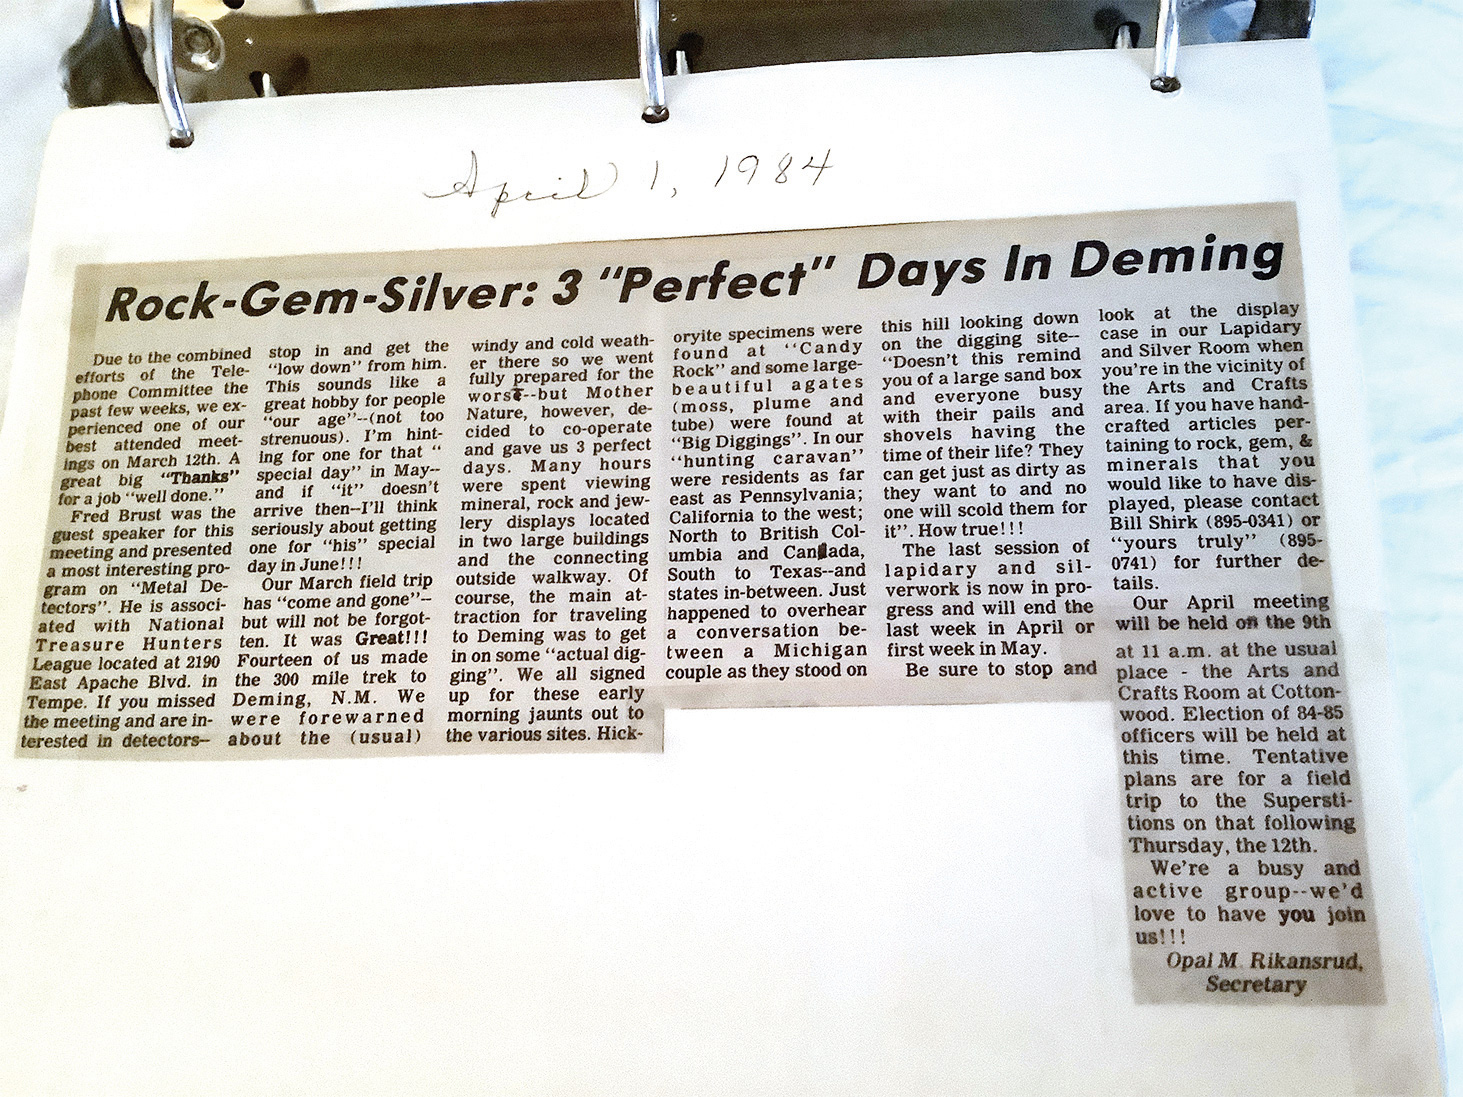 Great article written by Opal M. Rickensrud in the 'Splash' in April, 1984.